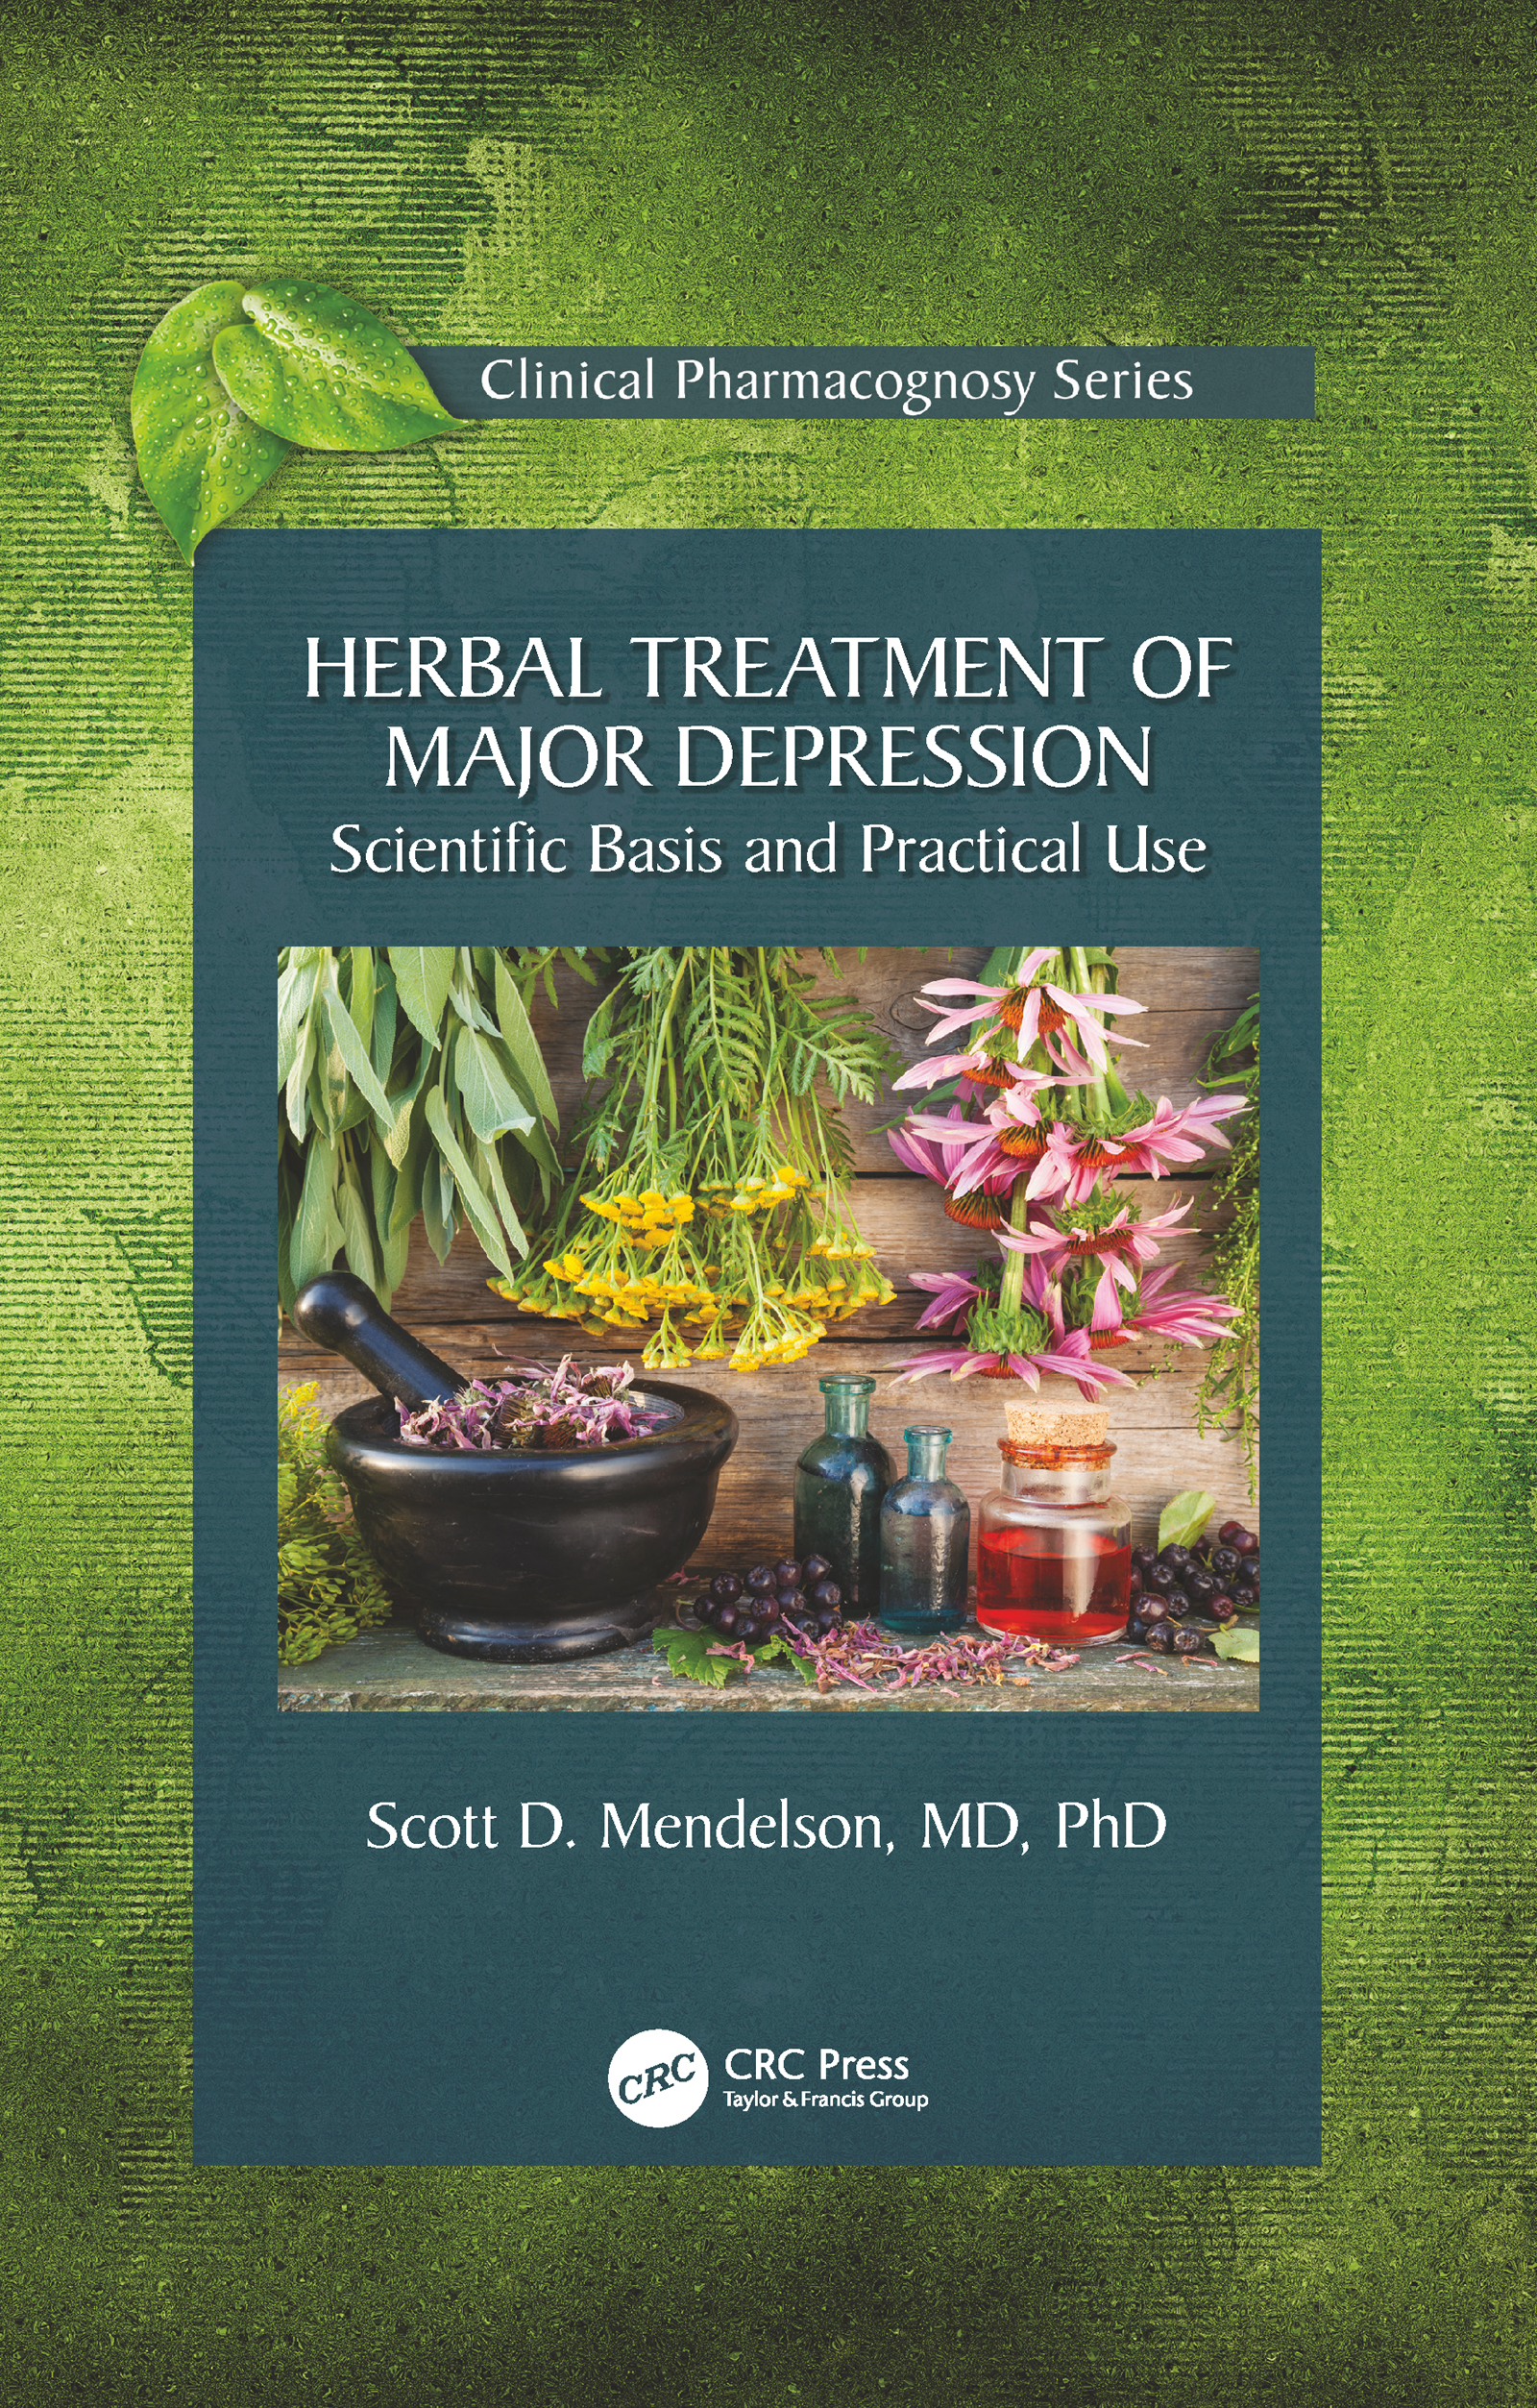 Herbal Treatment of Major Depression